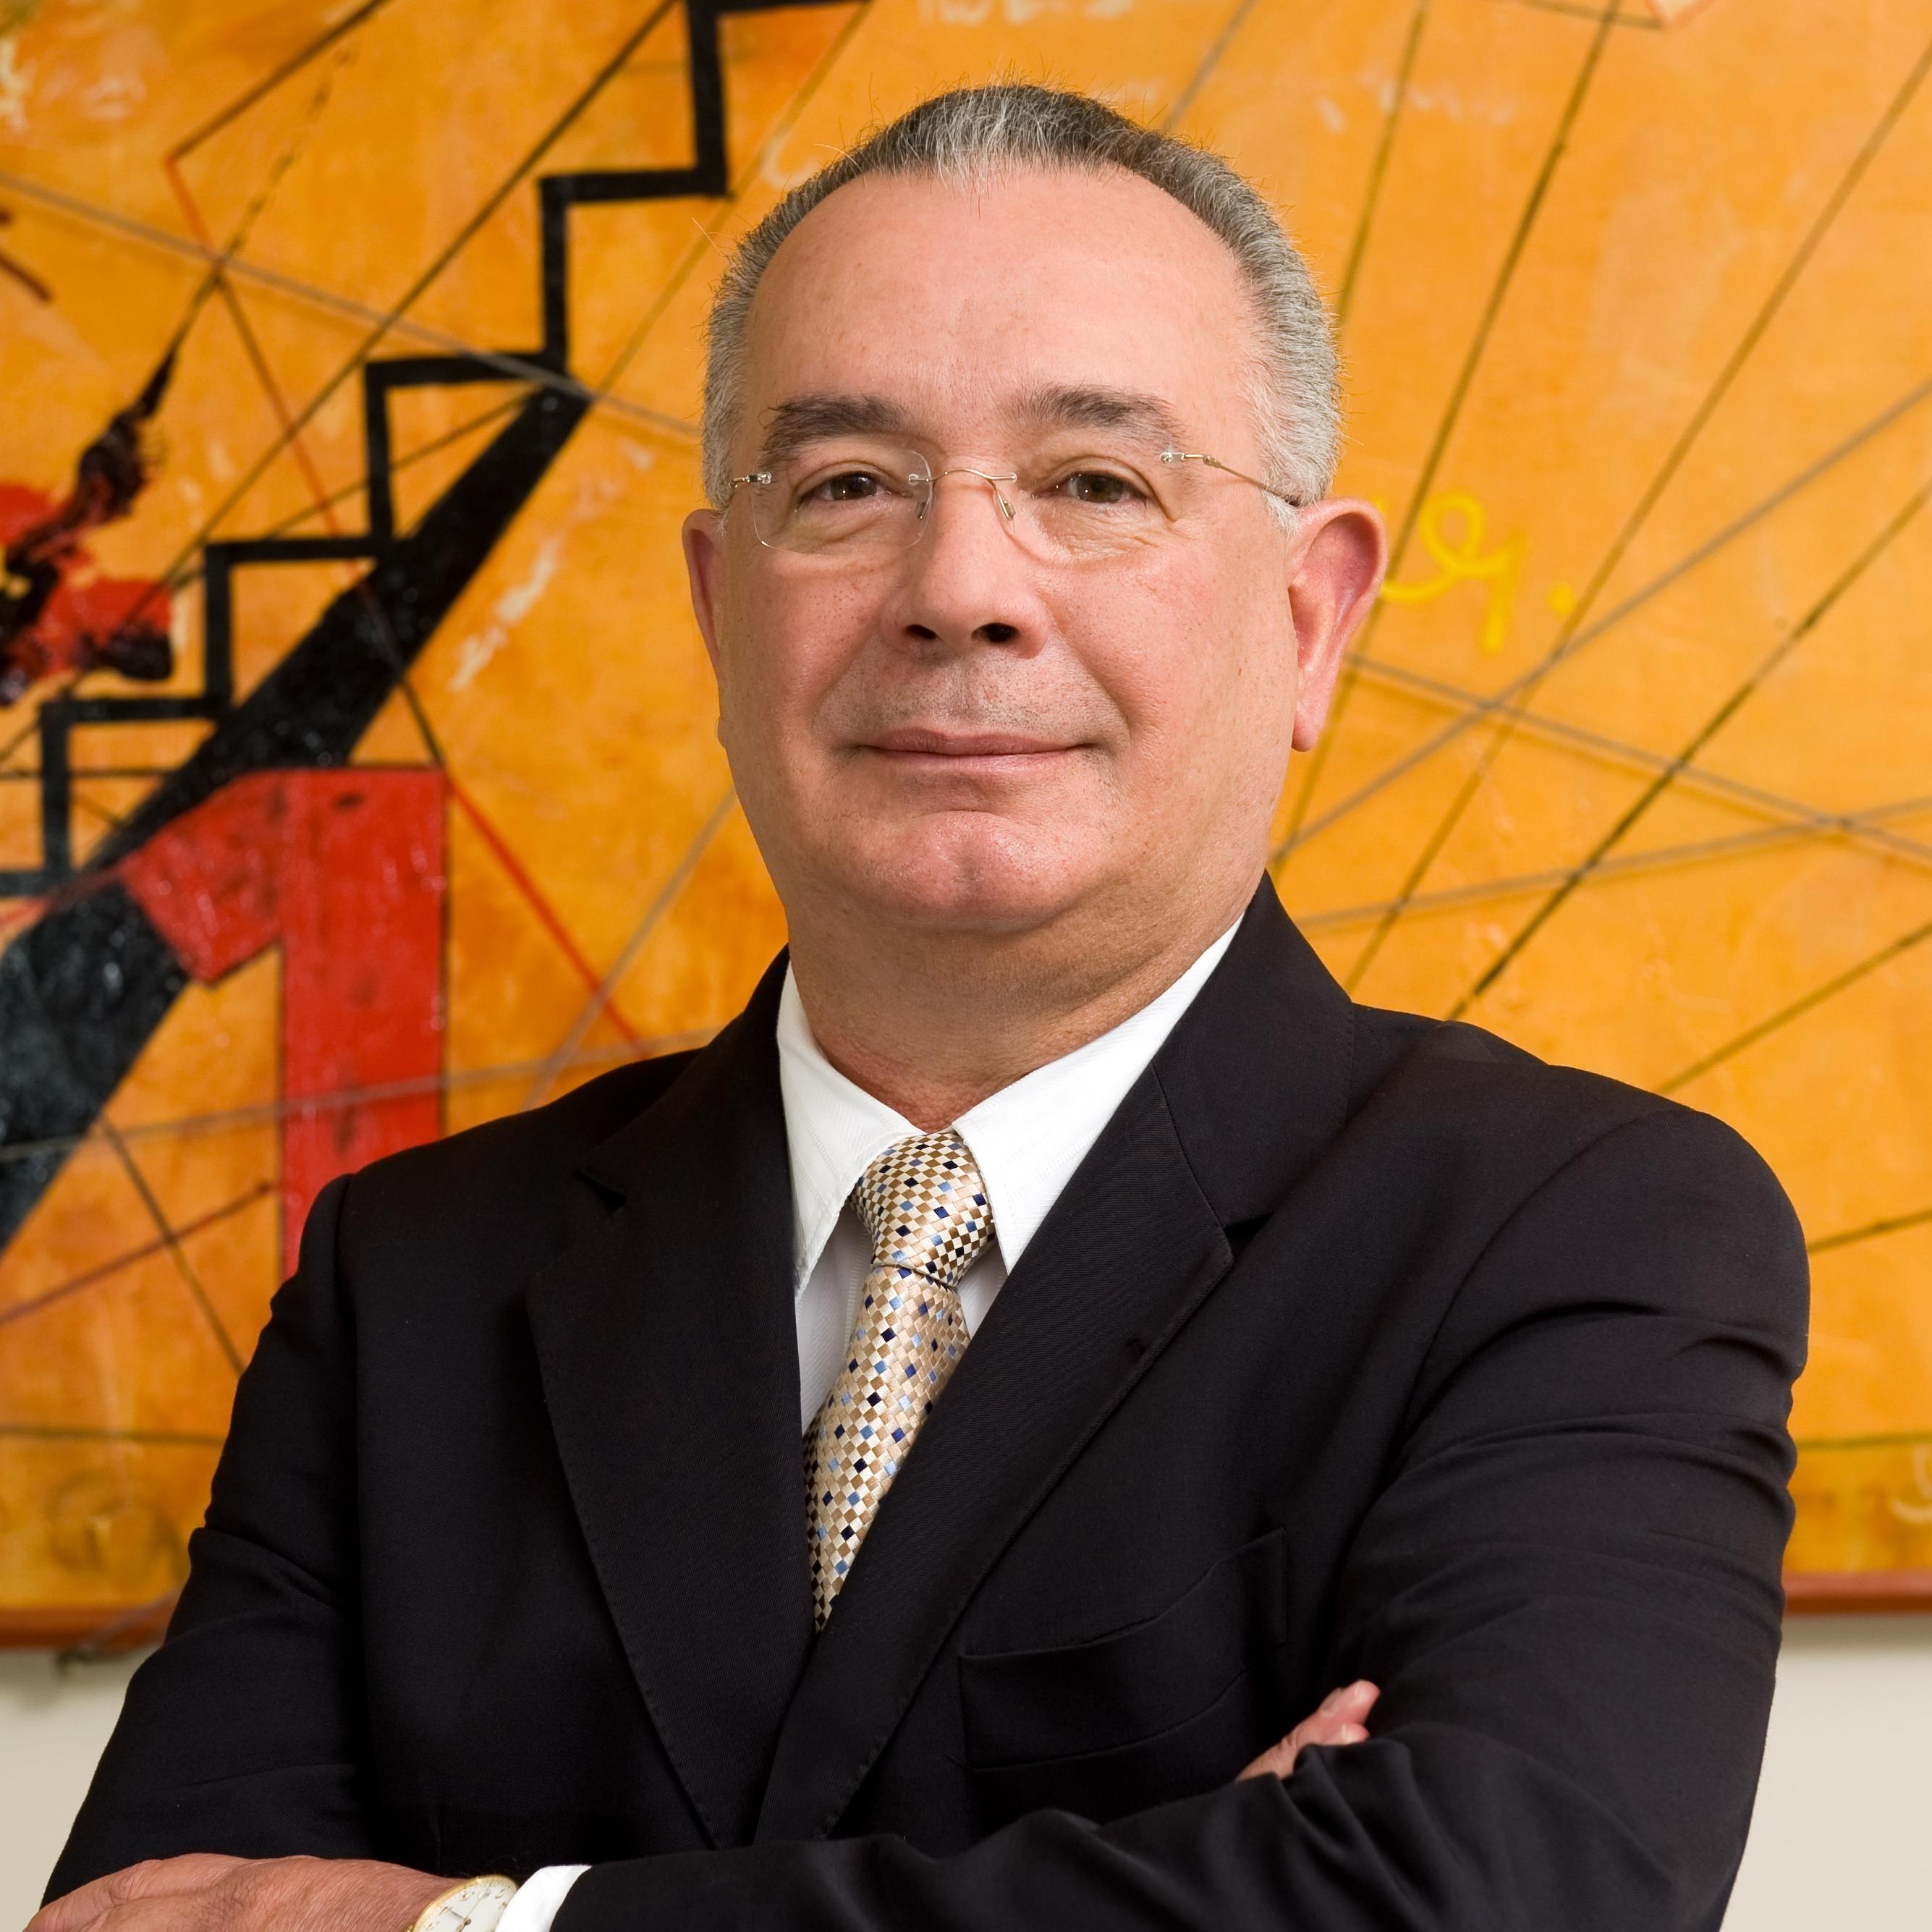 Alexandre Rangel